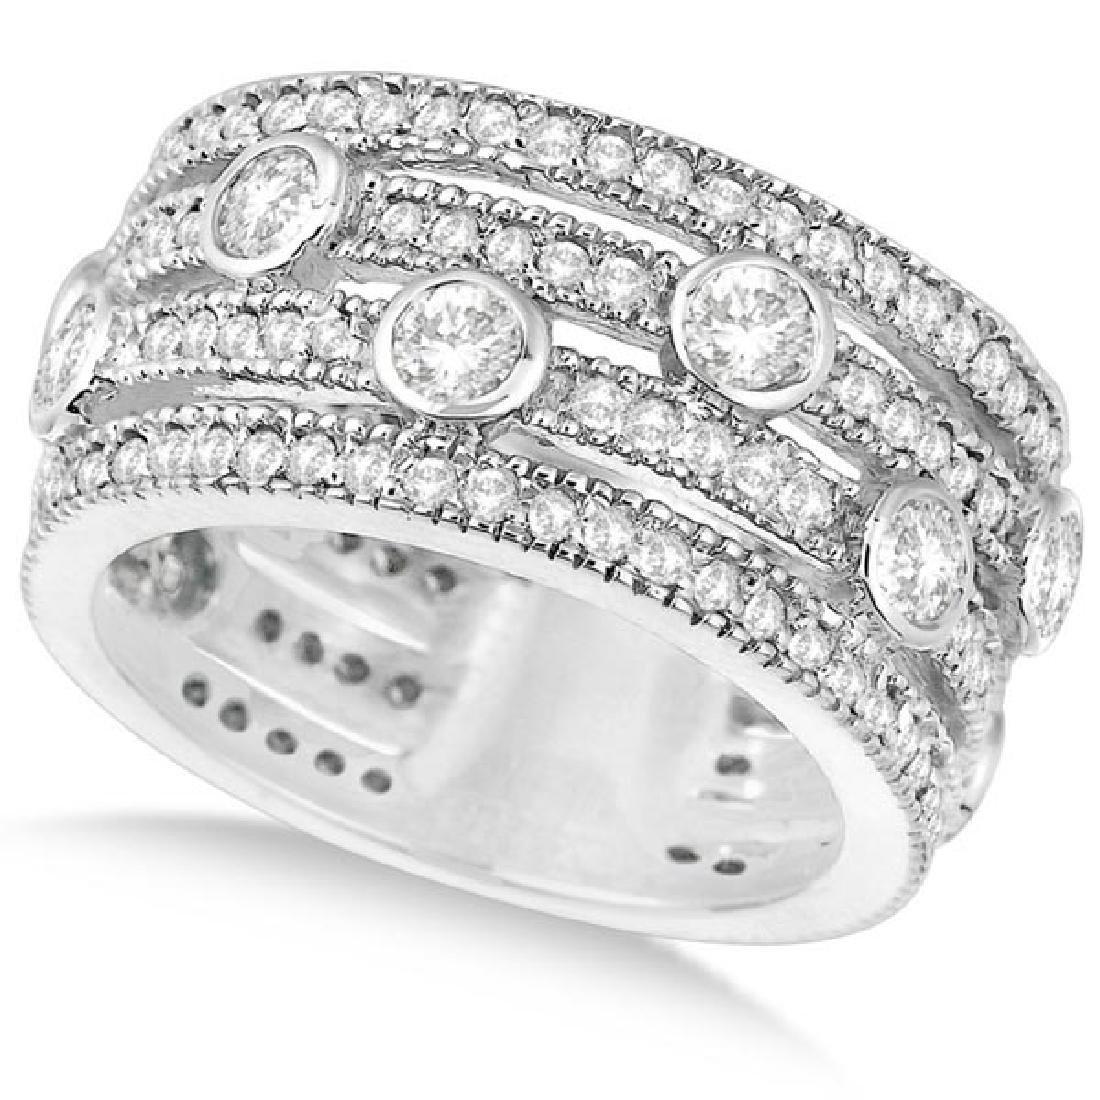 Vintage Bezel and Pave-Set Diamond Ring Band 14k White